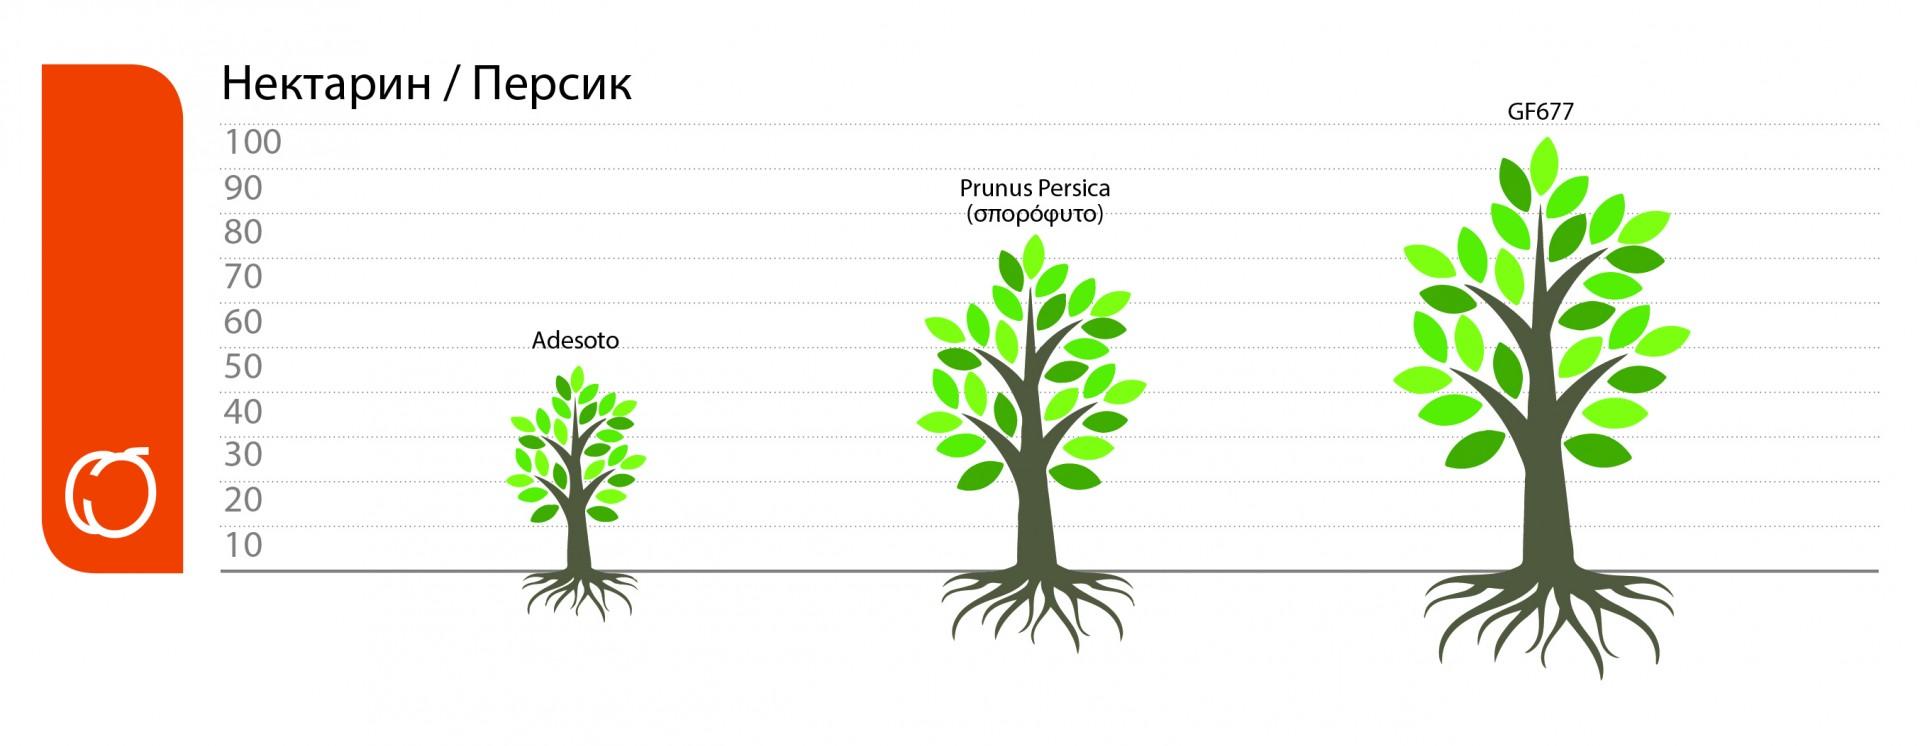 ypokeimena-nektarinies-rodakinies-ru.jpg